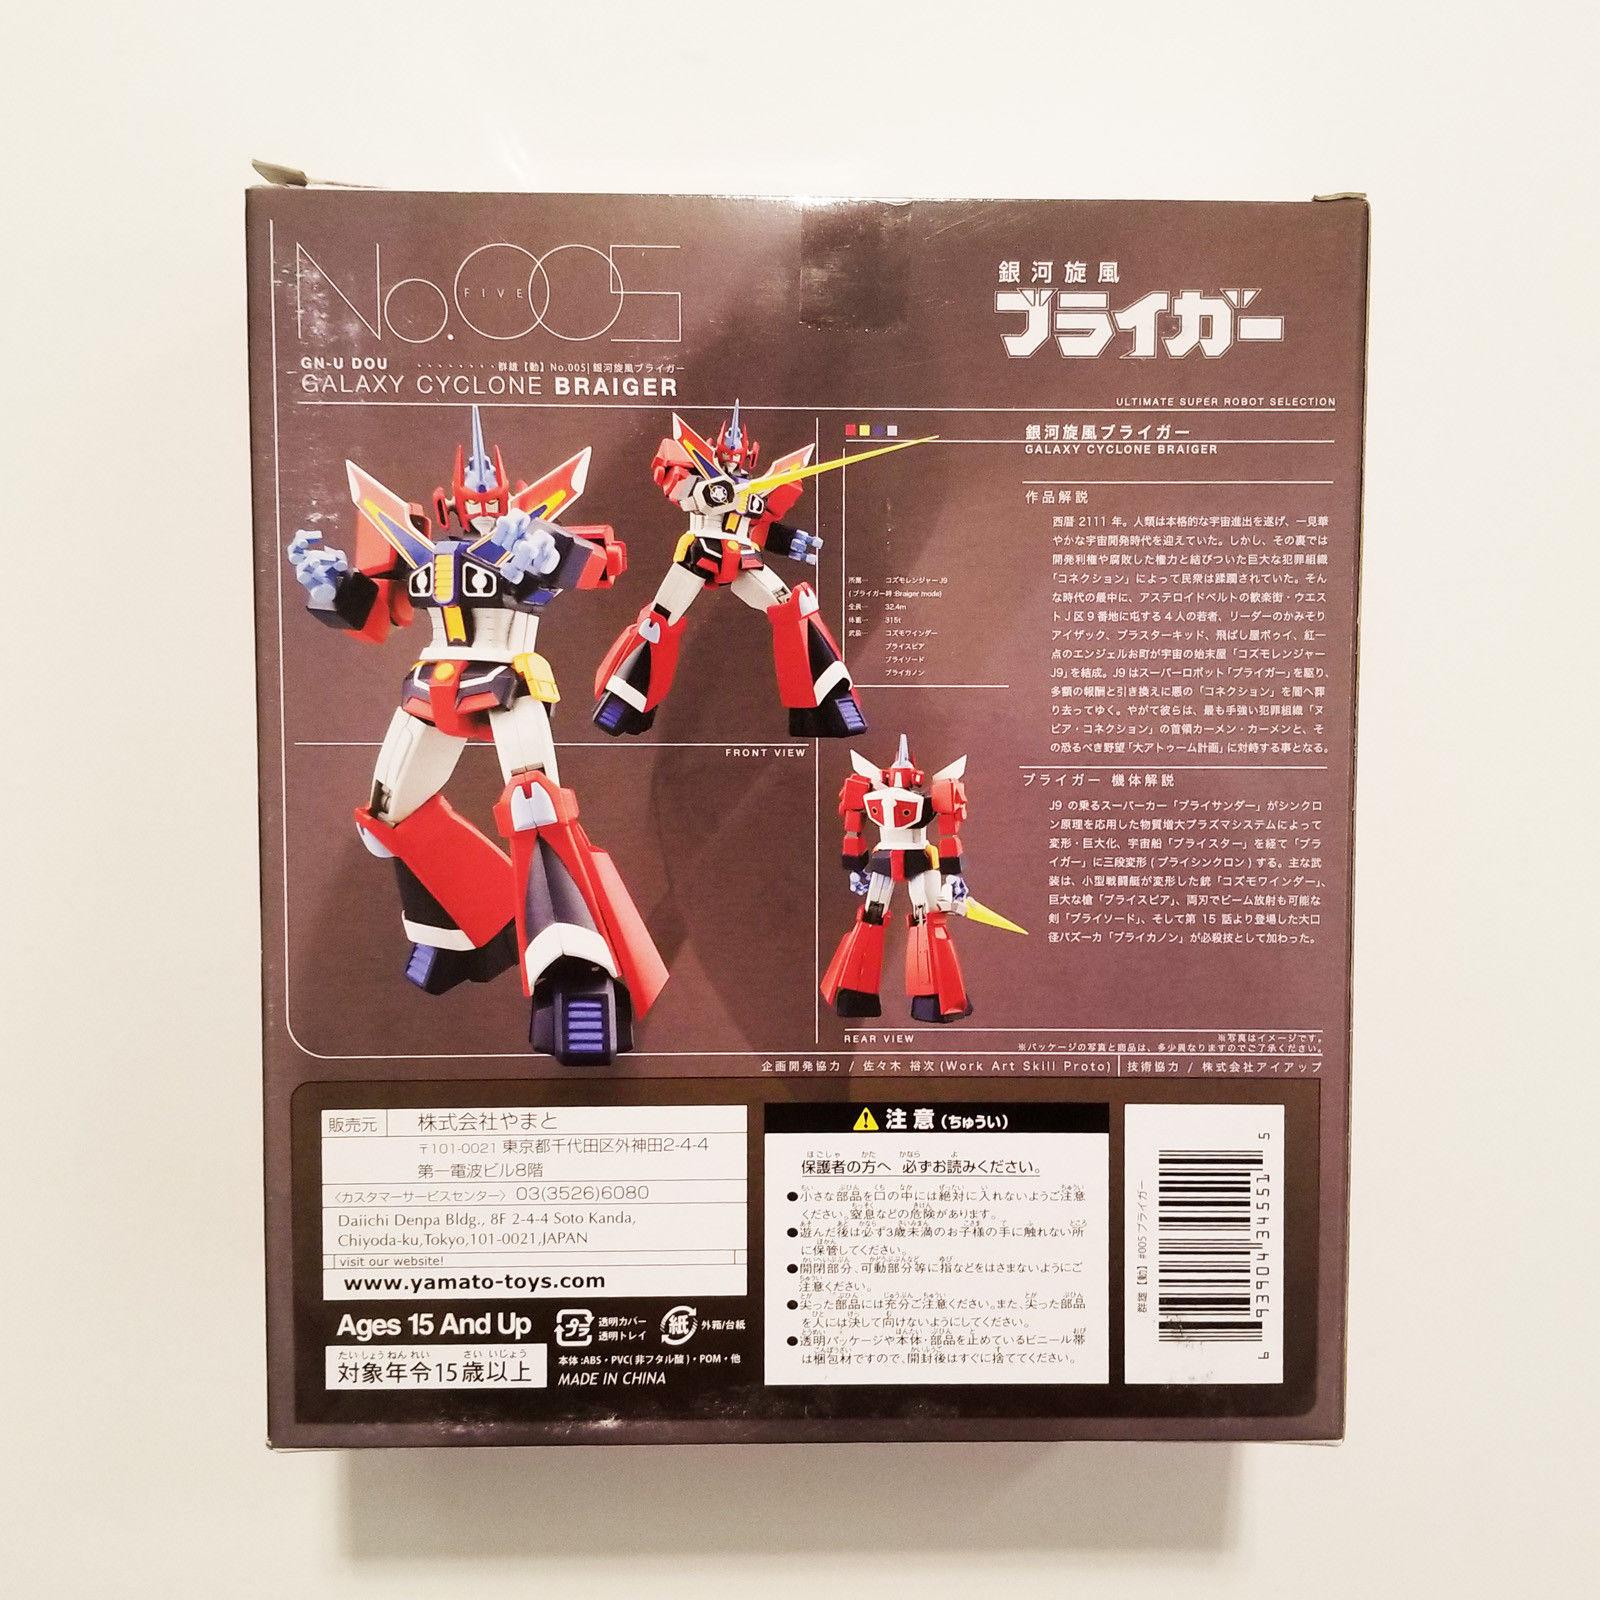 Yamato GN-U Dou Galaxy Cyclone Braiger #005 Ultimate Super Robot Action Figure